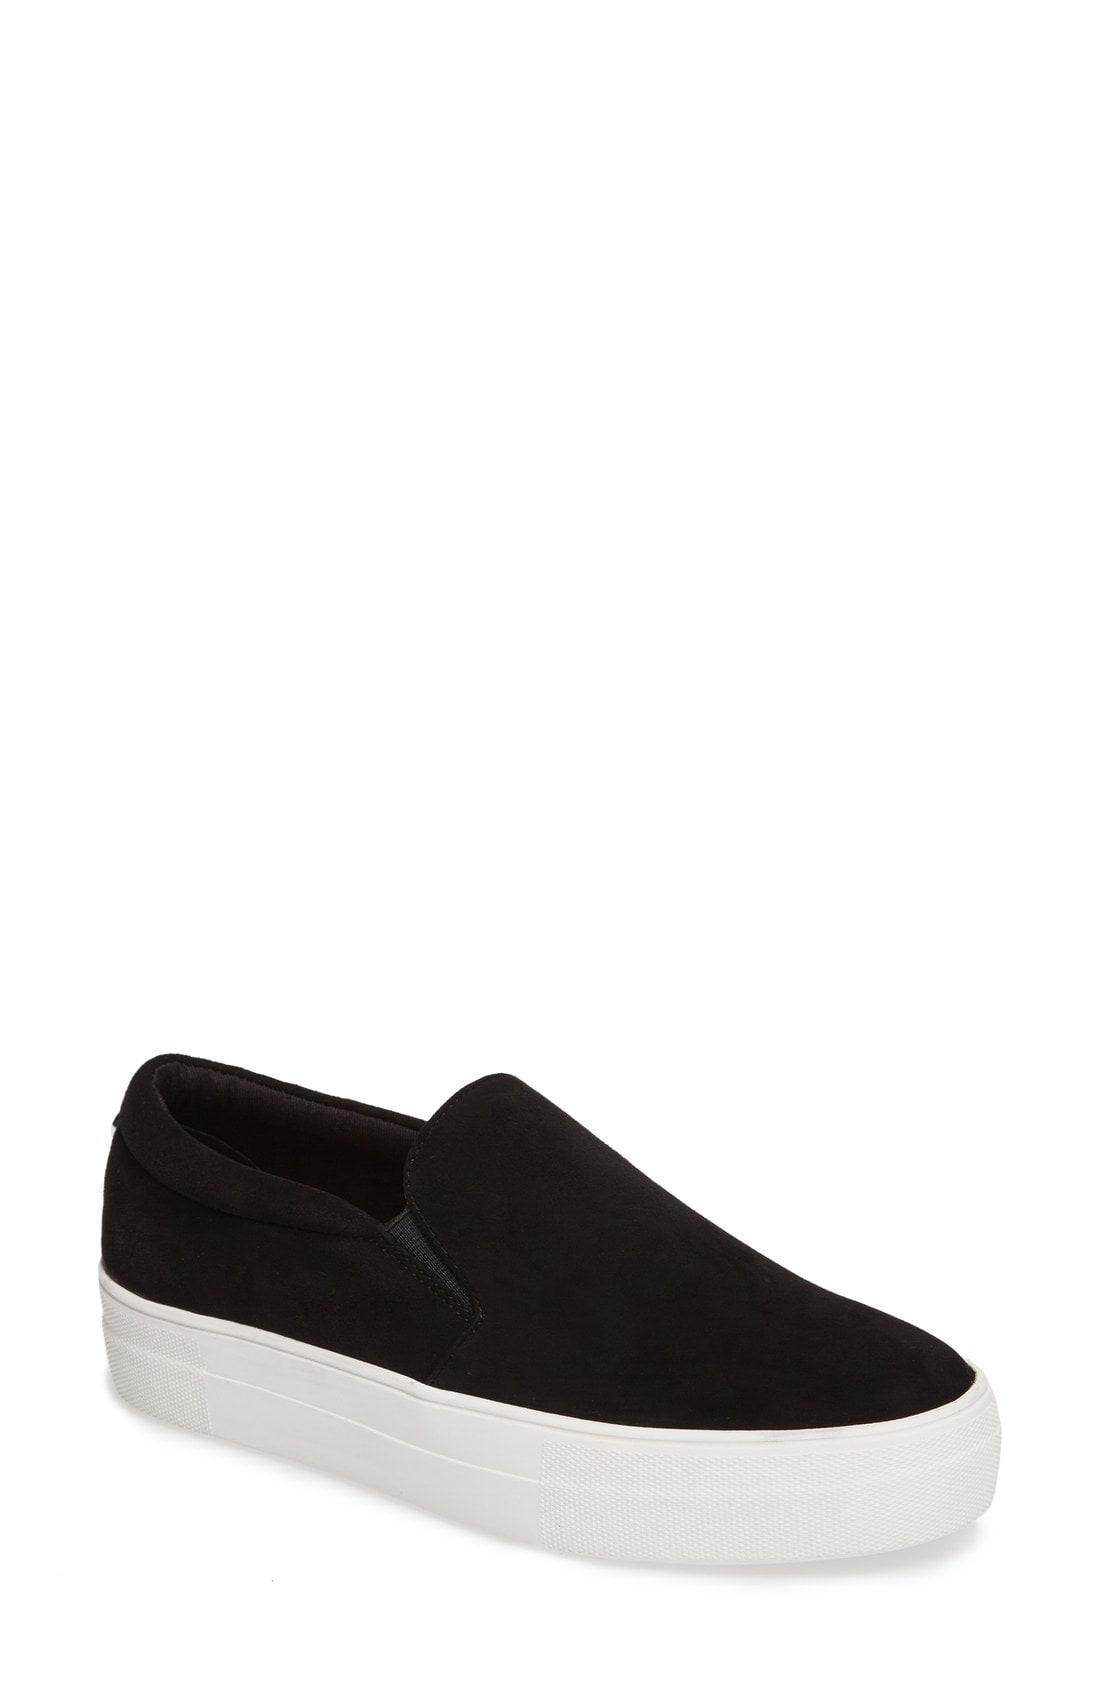 5136bc4b05b Steve Madden Gills Platform Slip-On Sneaker In Natural Raffia